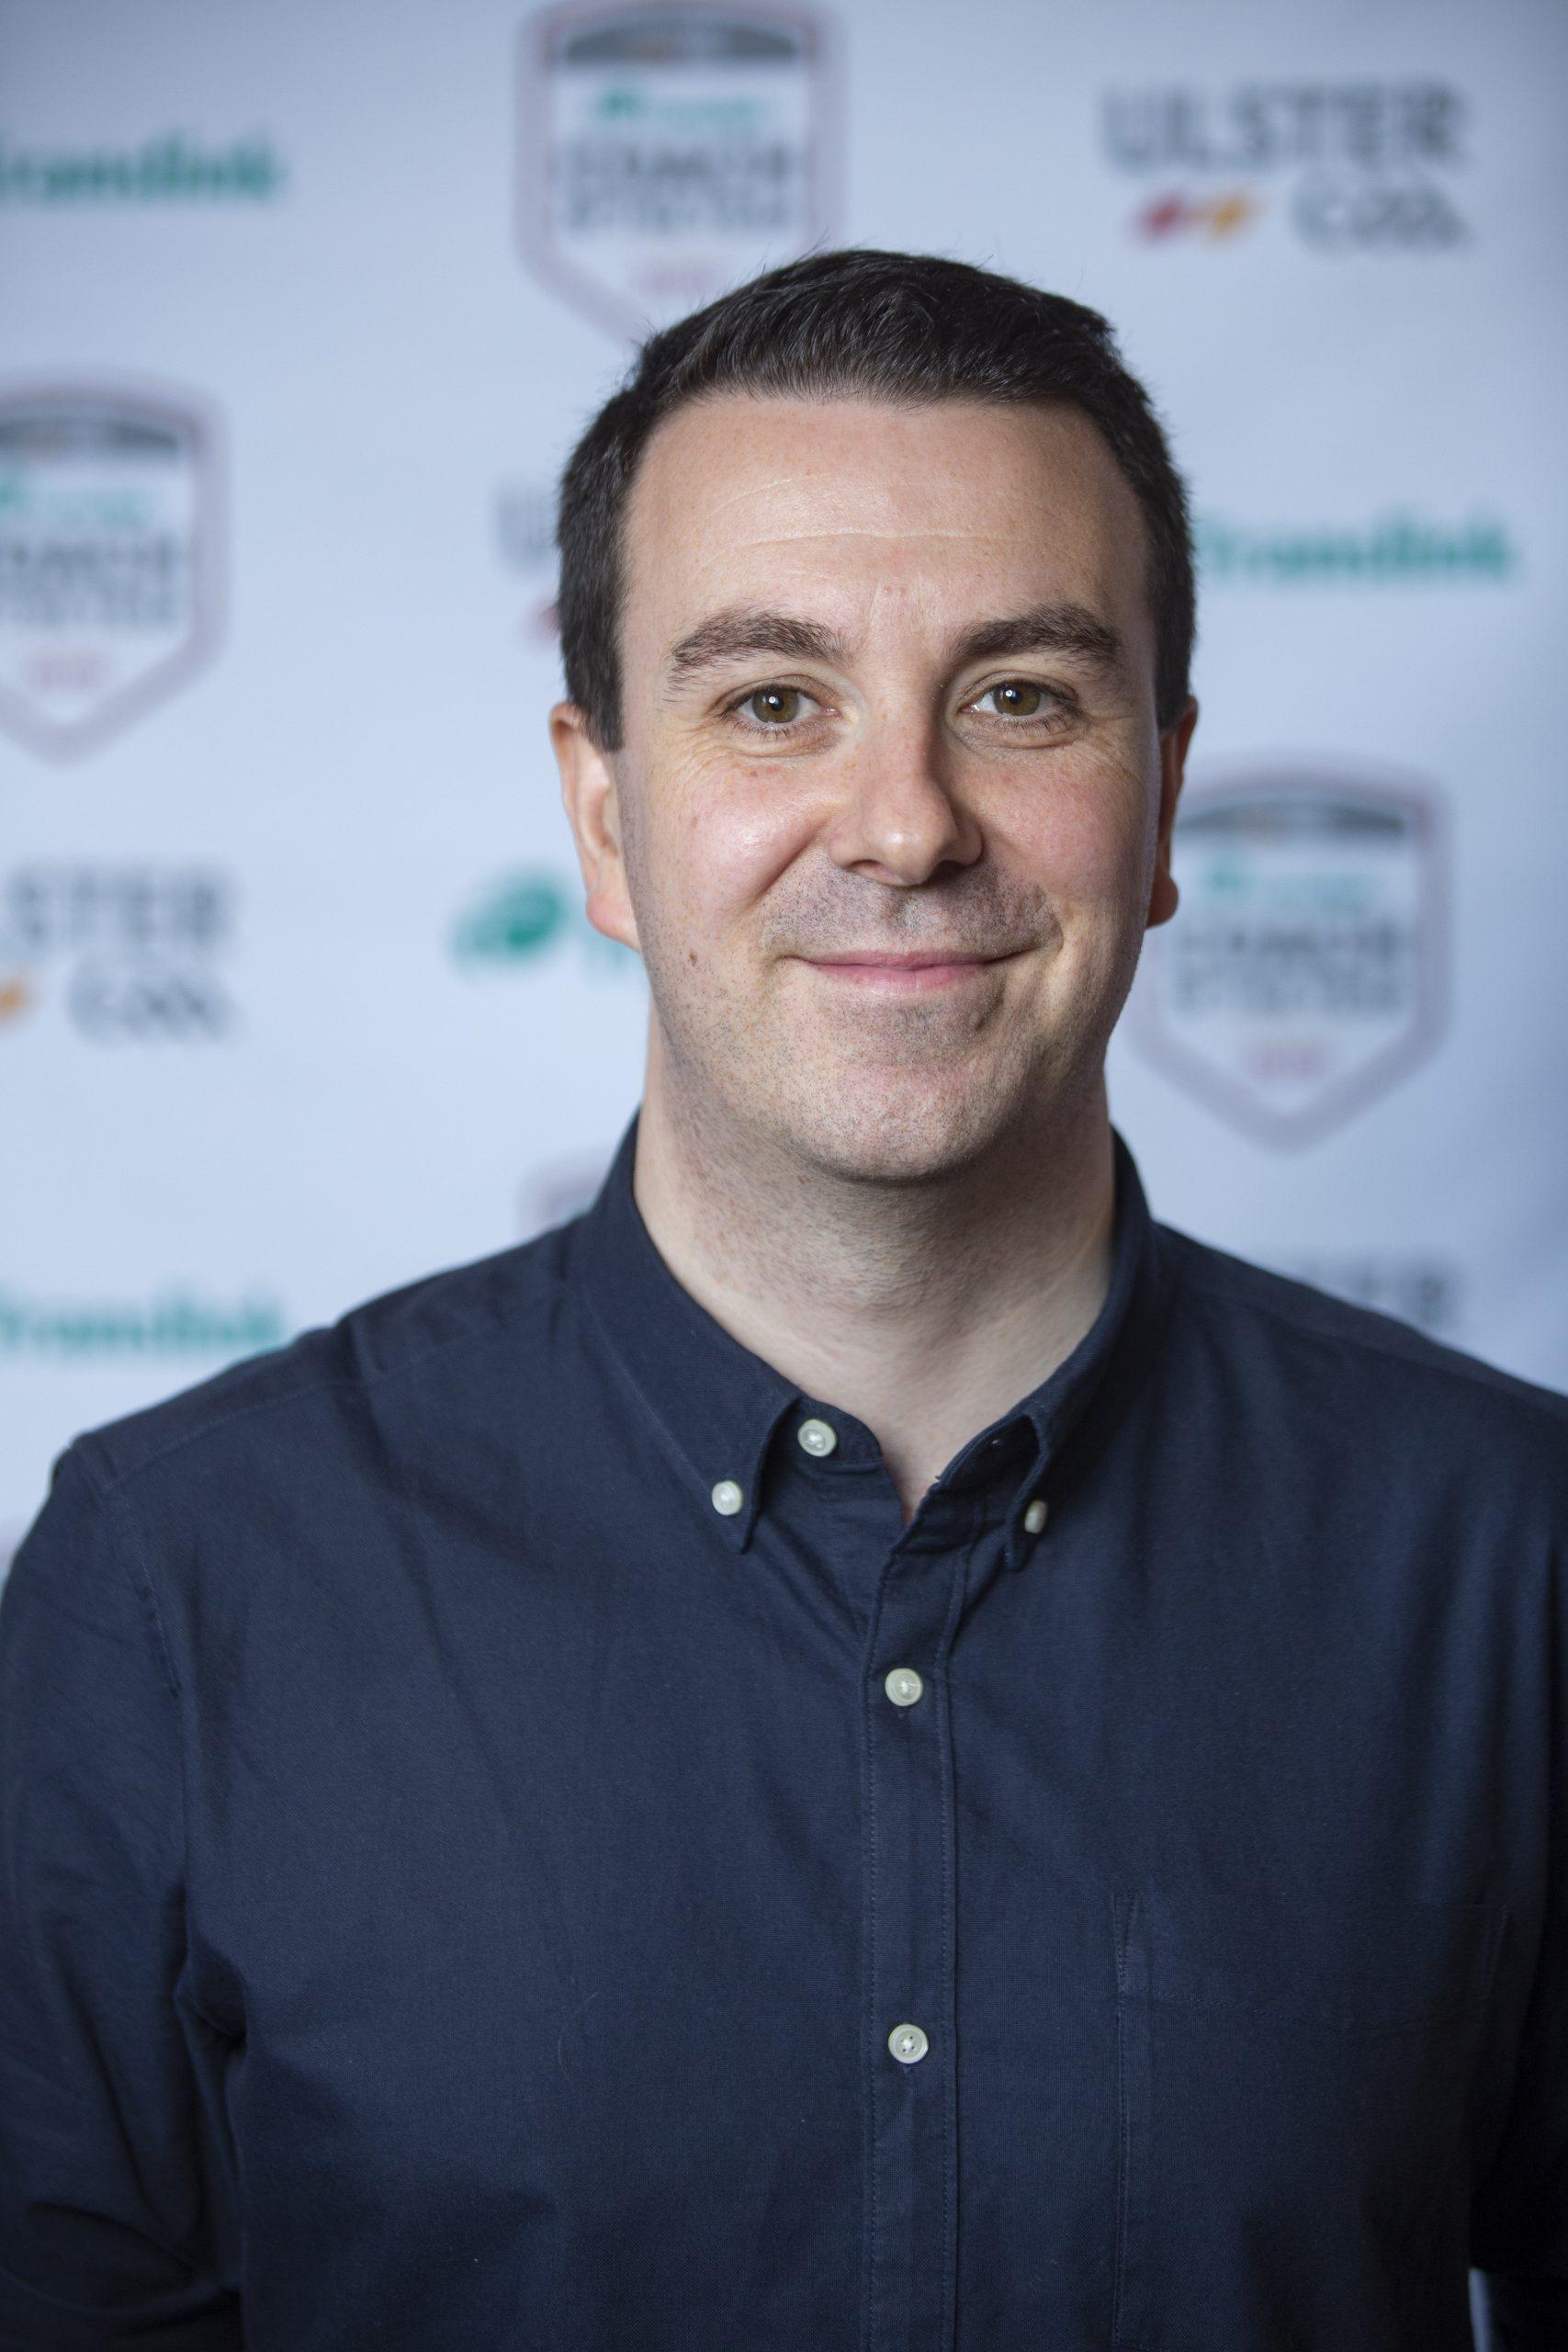 Neil Loughran